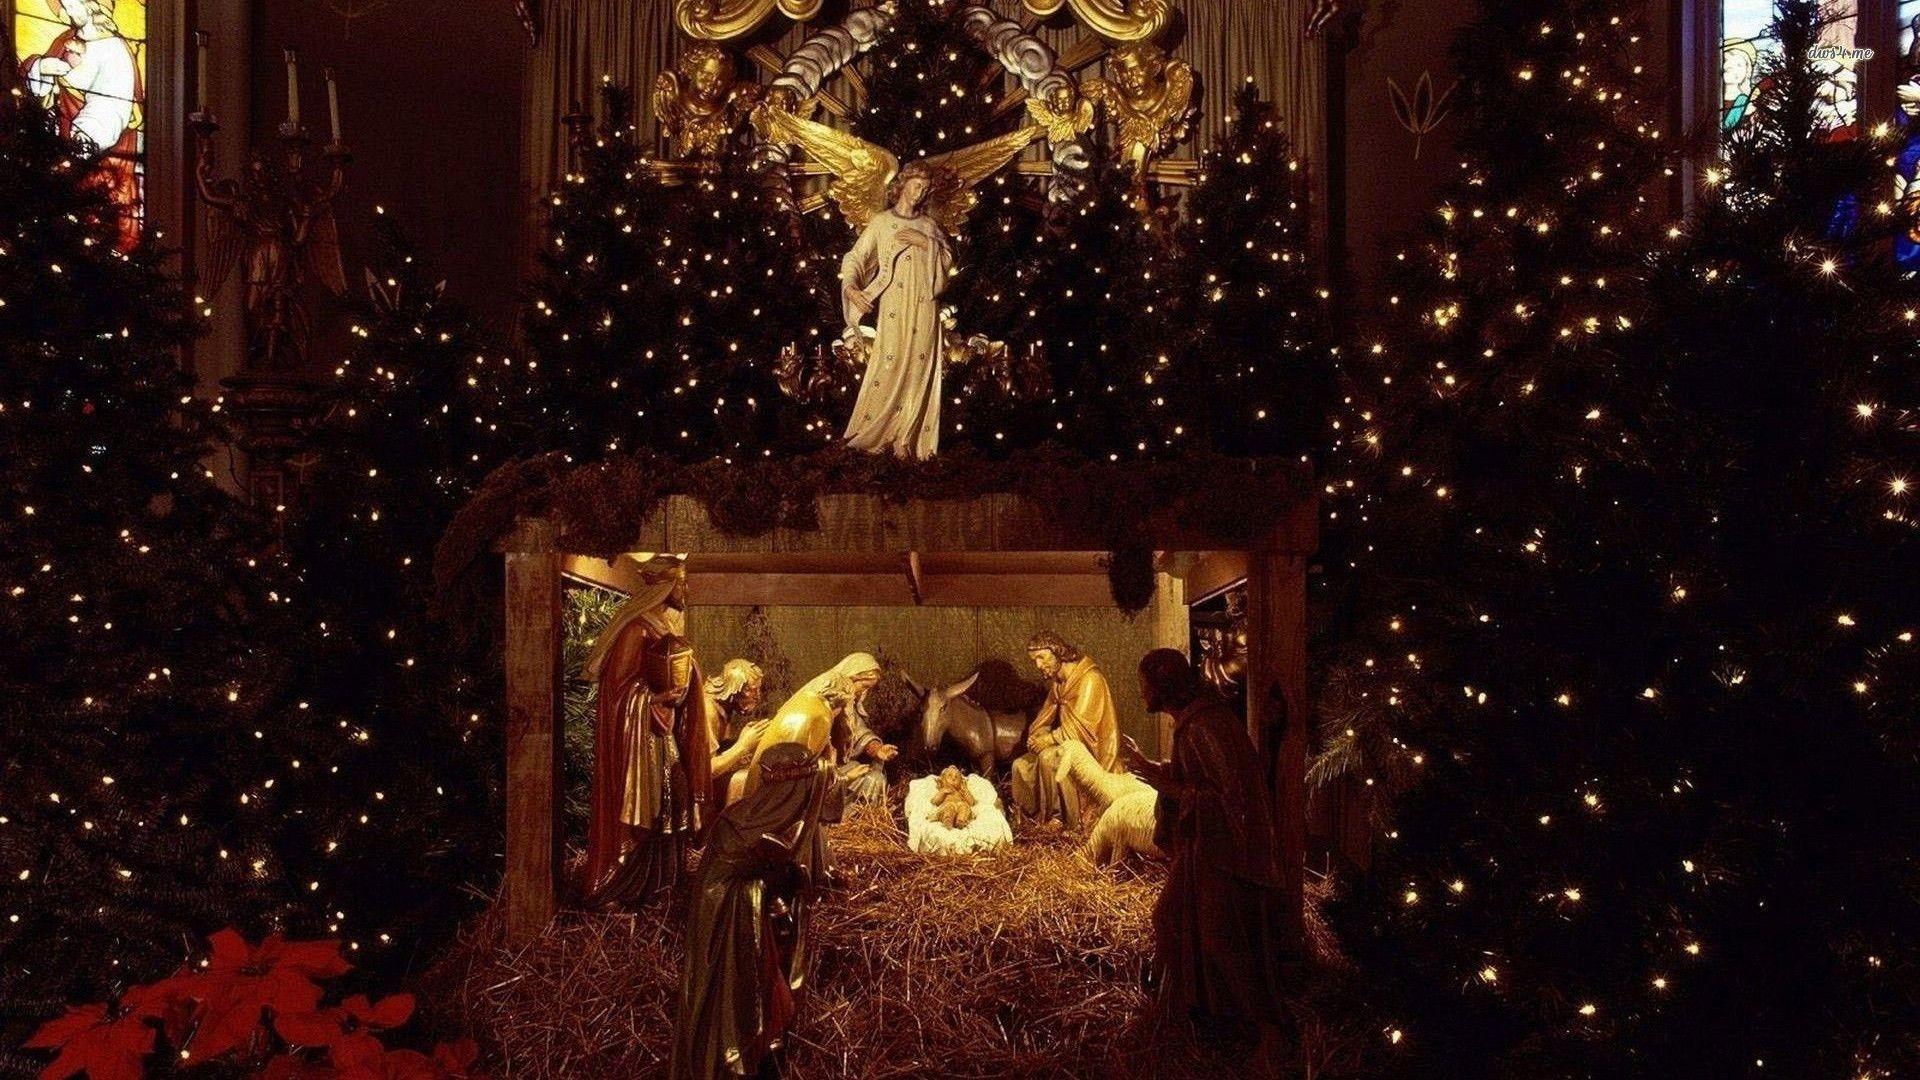 Christmas Nativity Backgrounds ① Wallpapertag